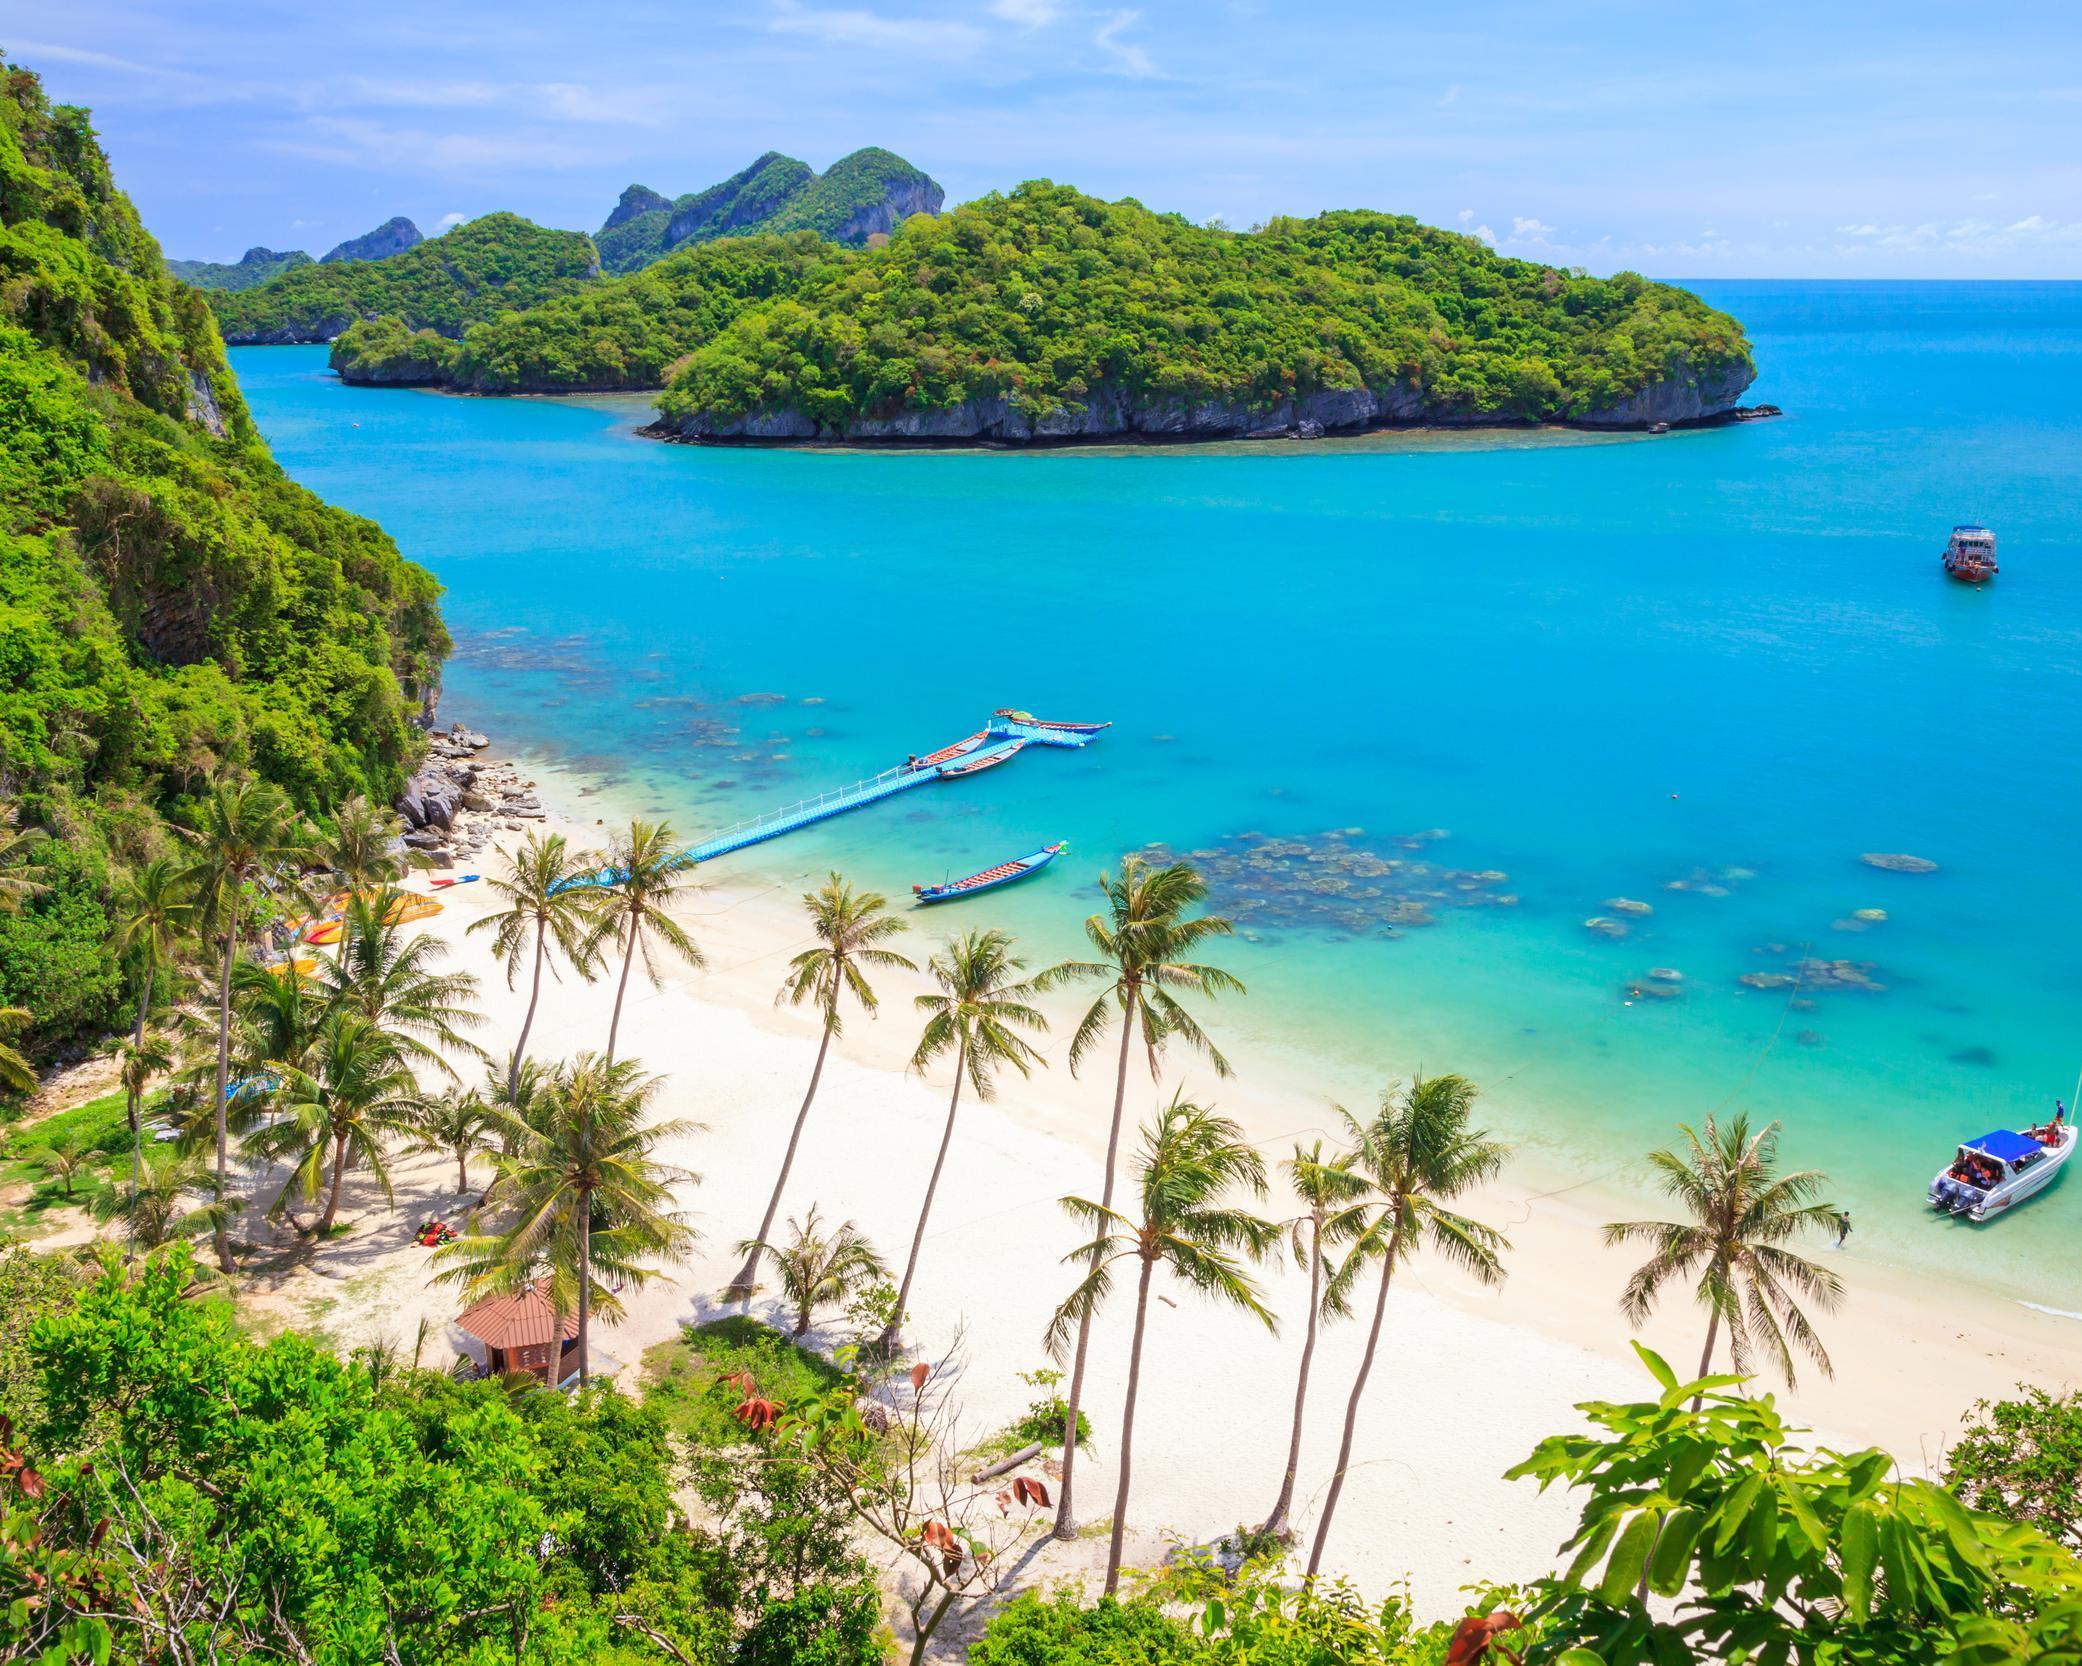 Tailandia Koh Samui Isla